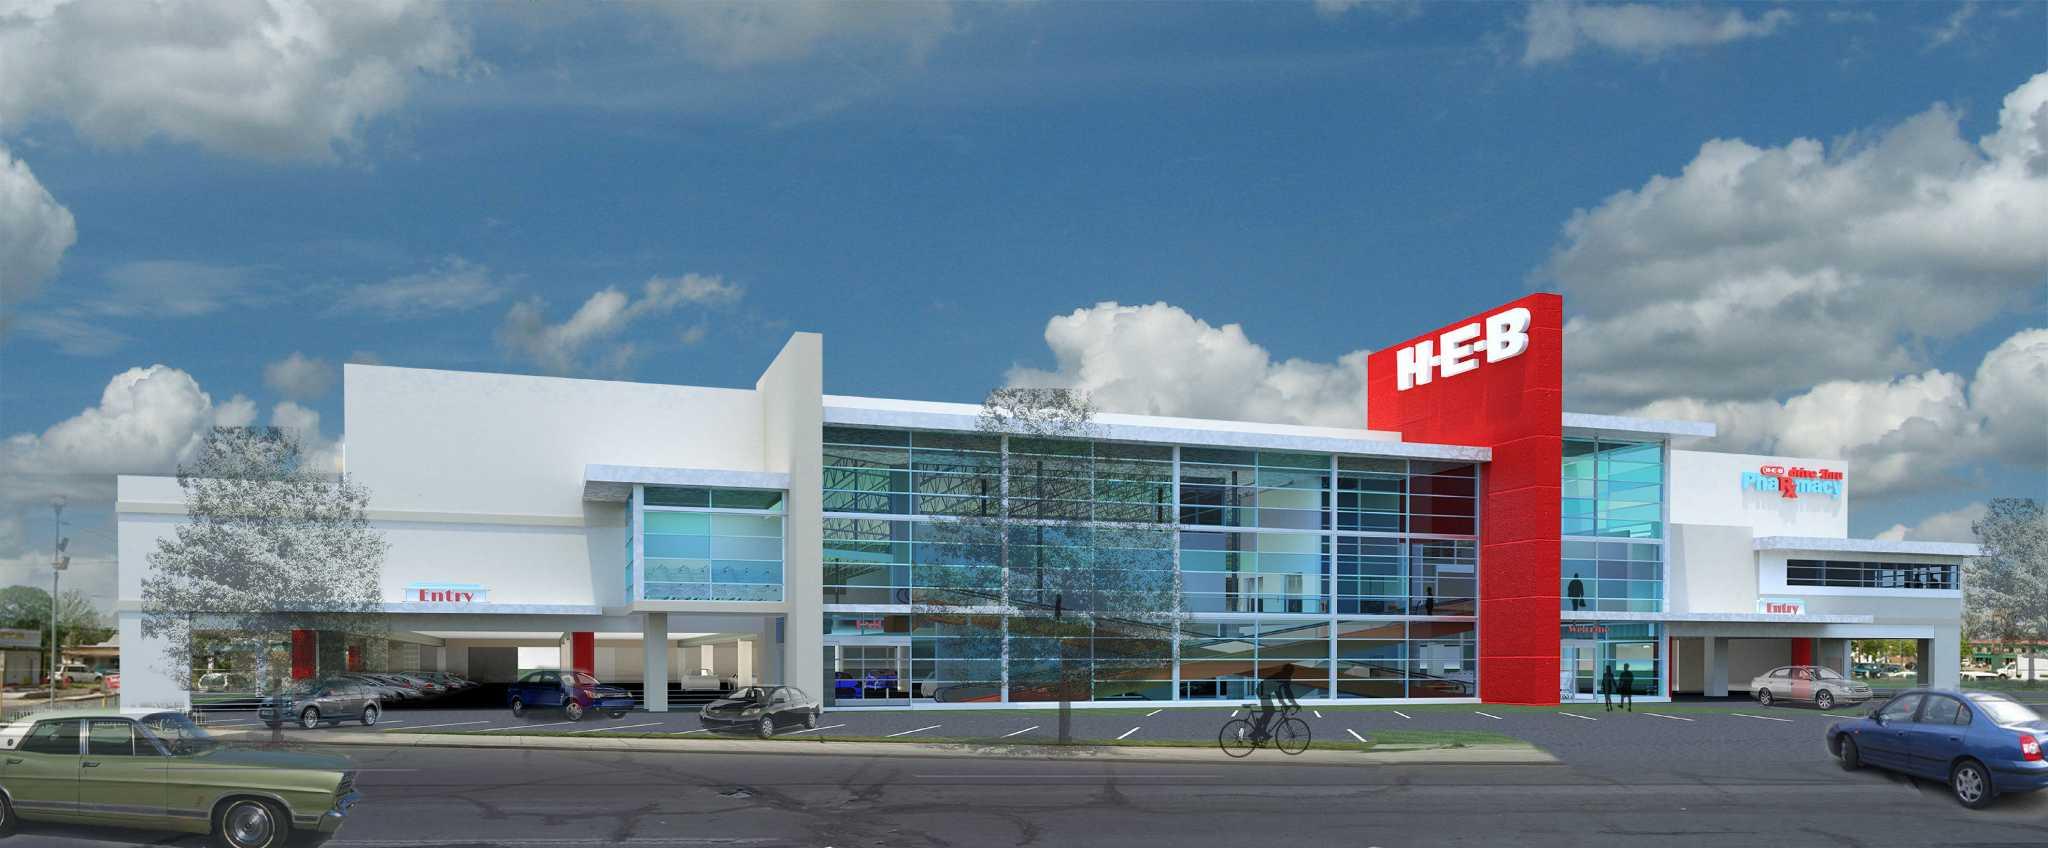 H E B Plans To Demolish Replace Nogalitos Store San